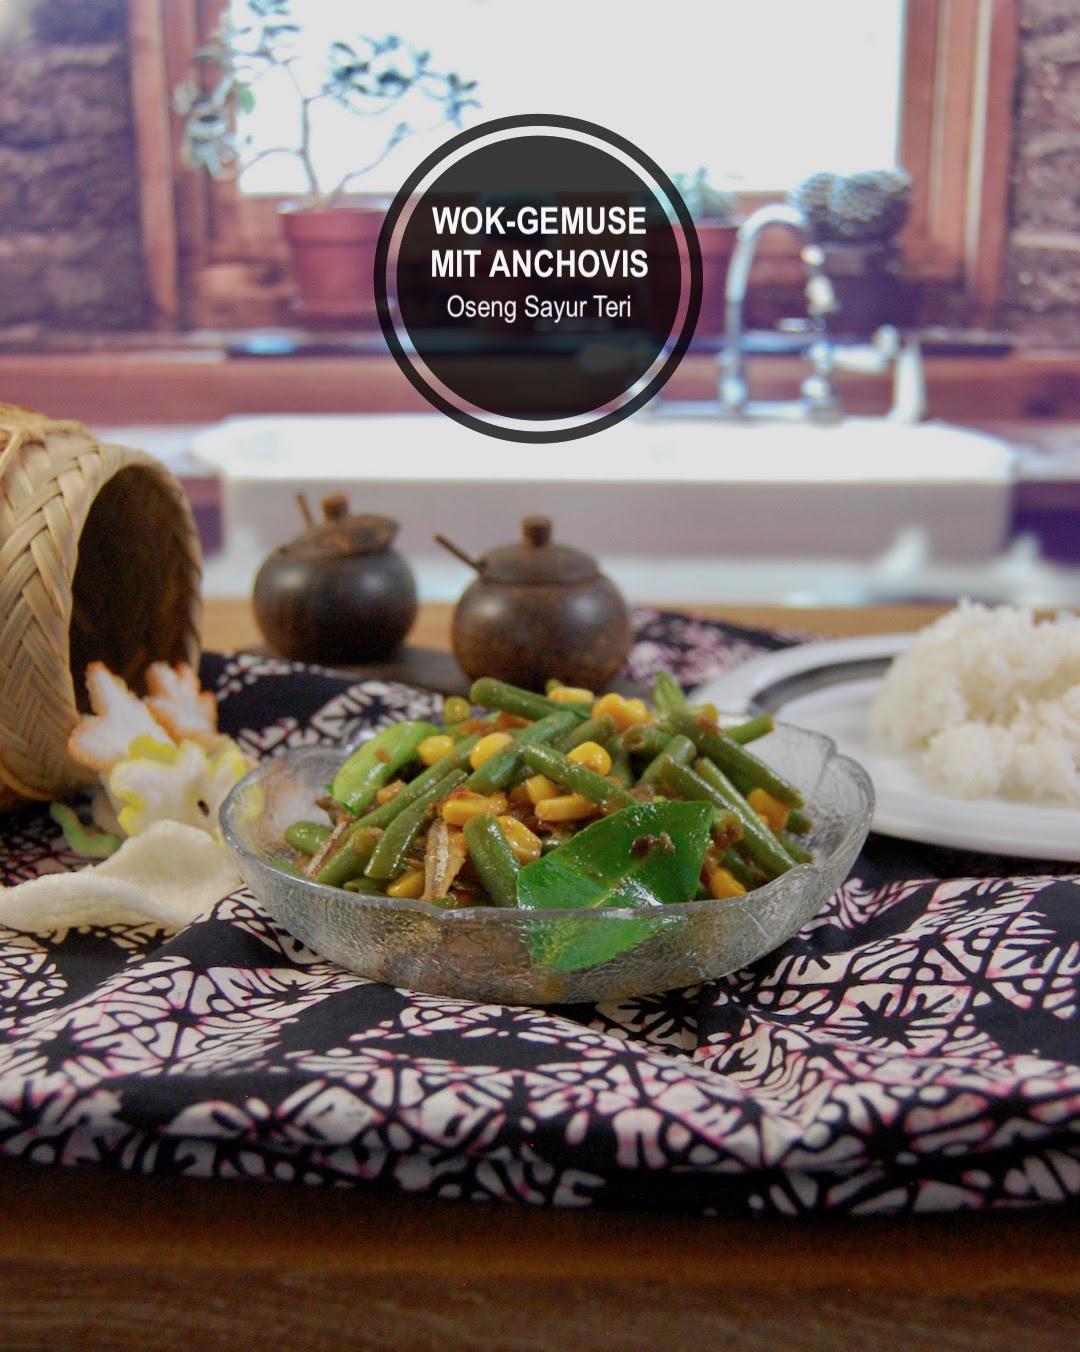 Rezept Wok-Gemüse mit Anchovis (Balinesisch Oseng Sayur Teri)